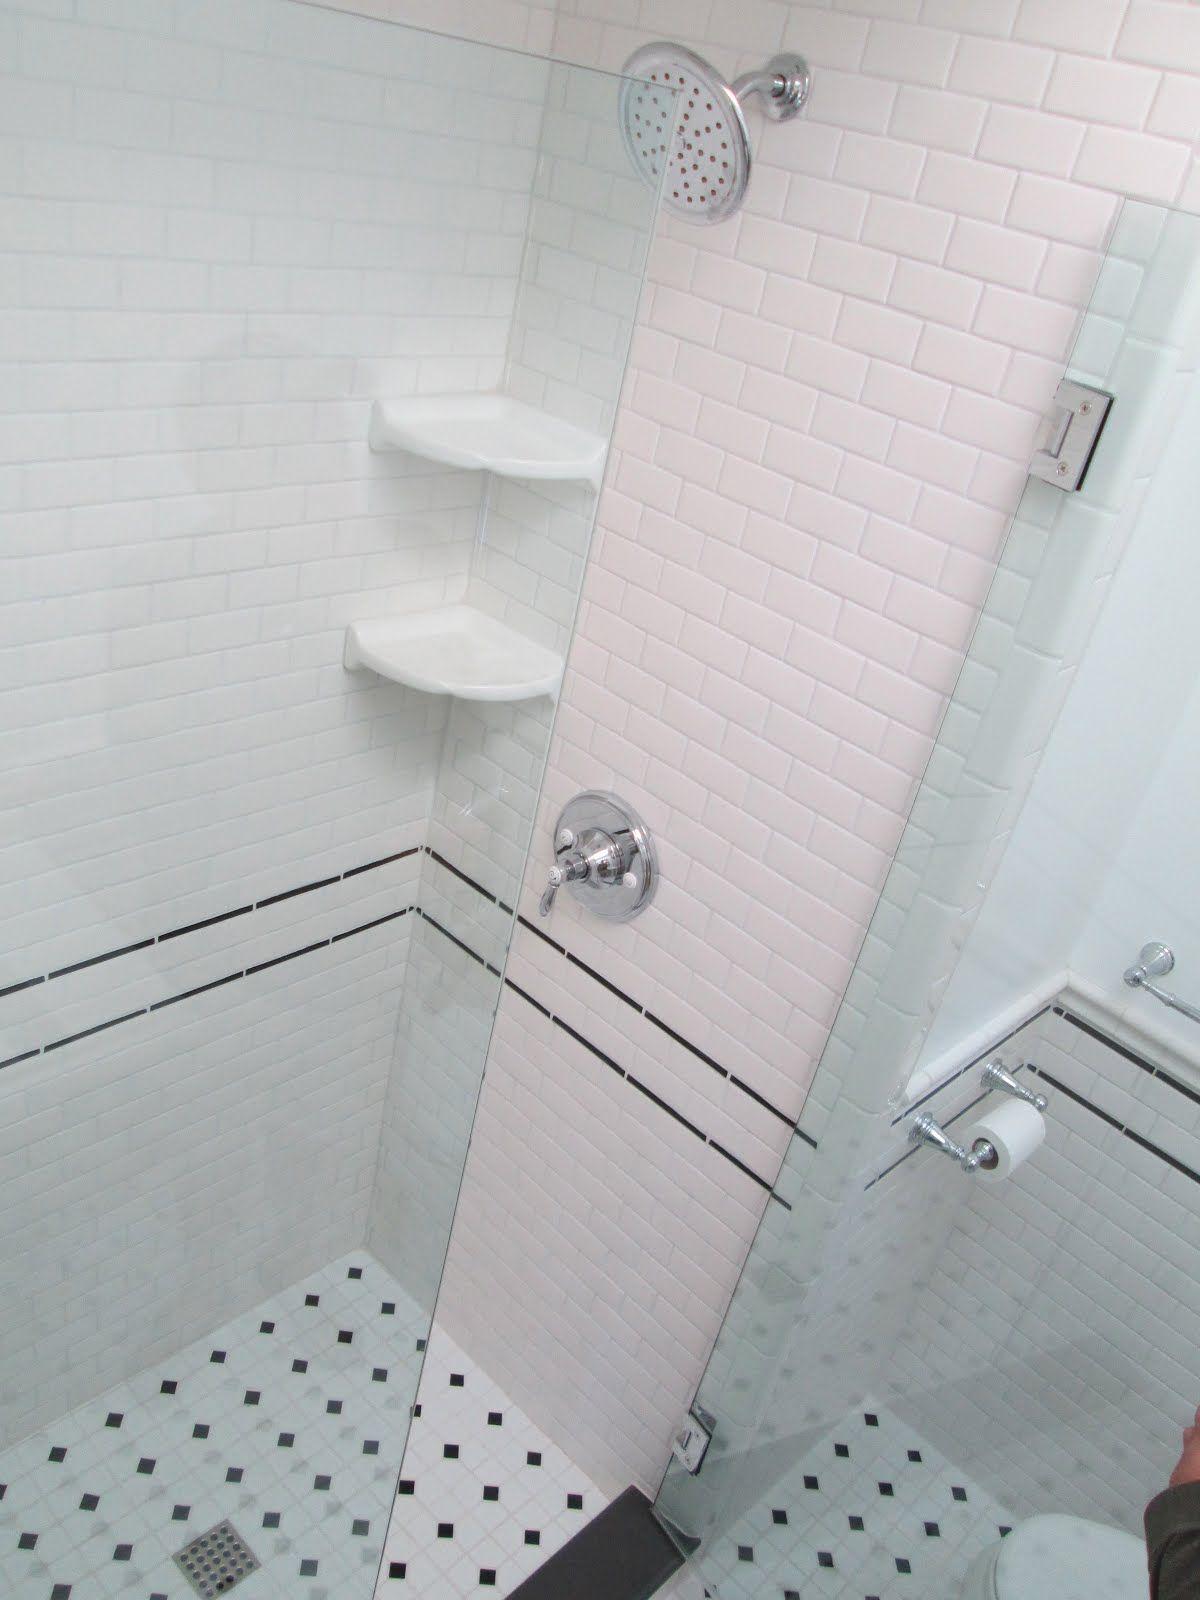 Green And Gray Bathroom Design Ideas Http Www Kittencarcare Info Green And Gray Bathroom White Subway Tile Shower Small Bathroom Tiles White Bathroom Tiles